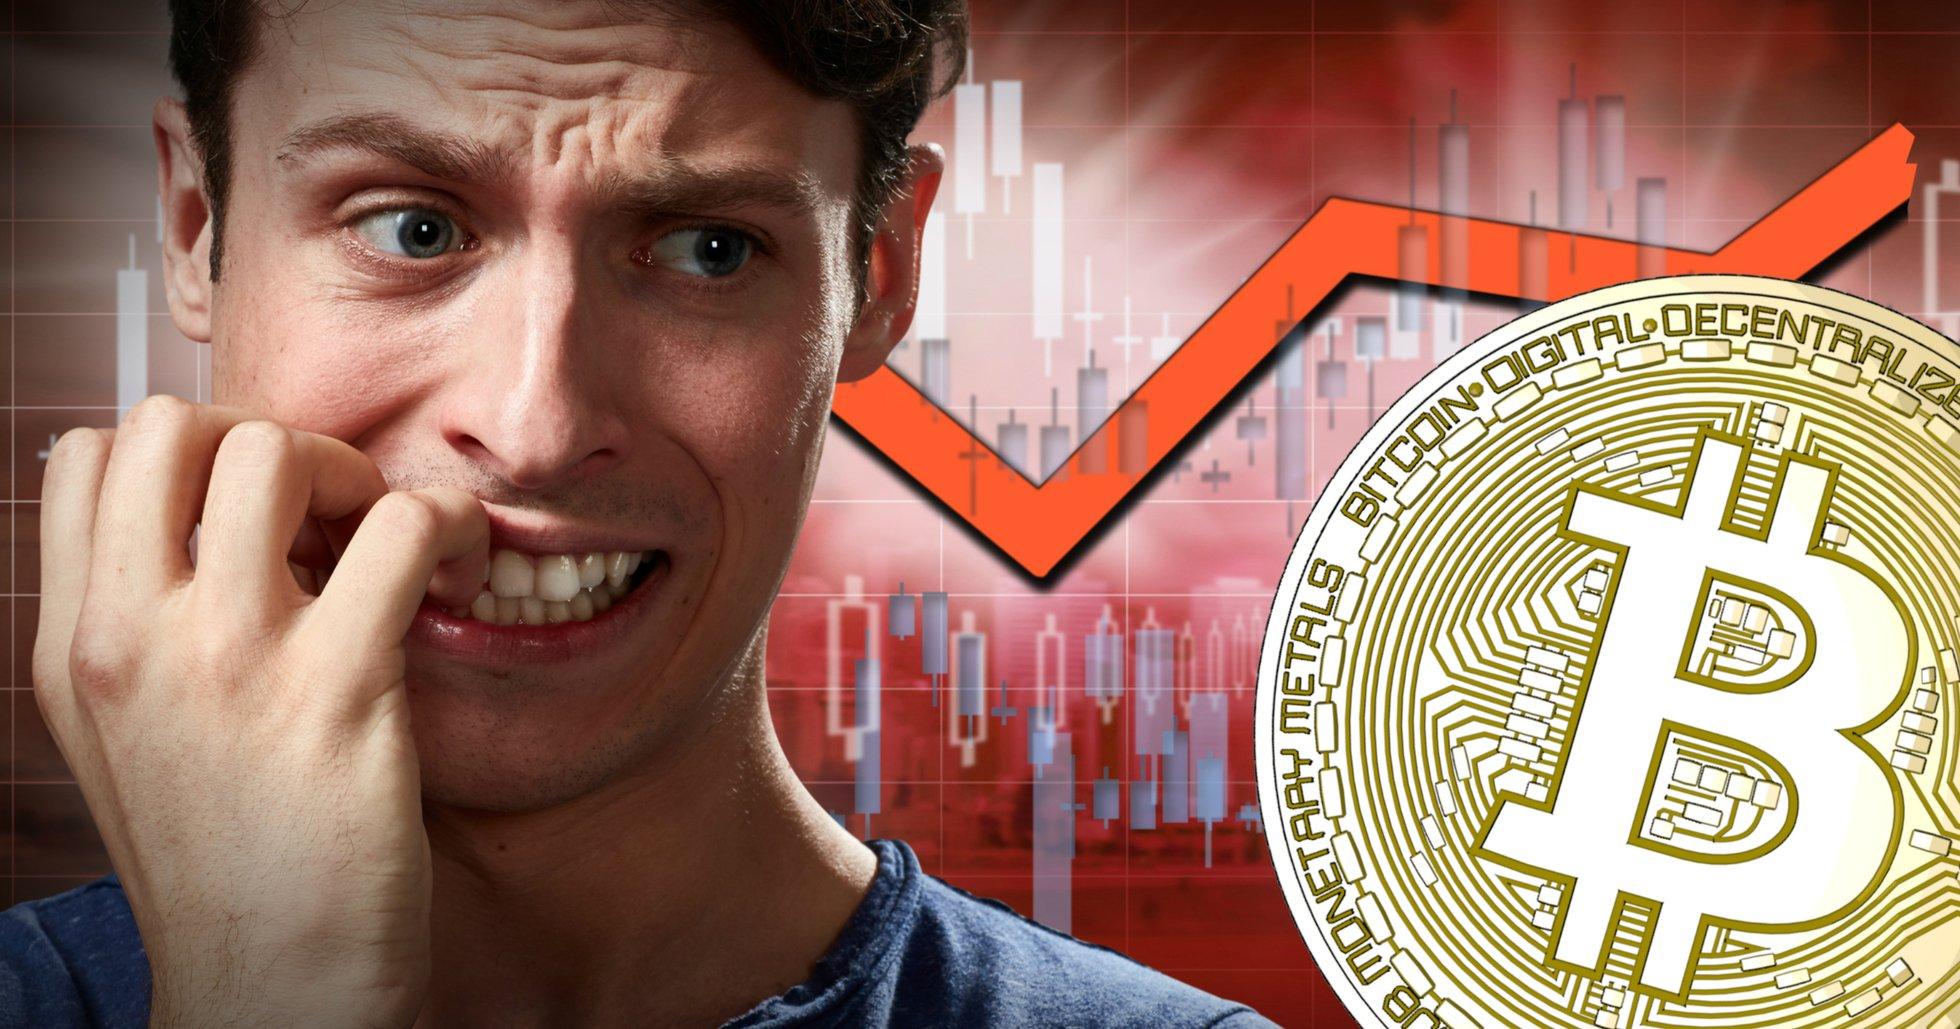 Bitcoinpriset faller – har gått ner nästan 10 procent under det senaste dygnet.